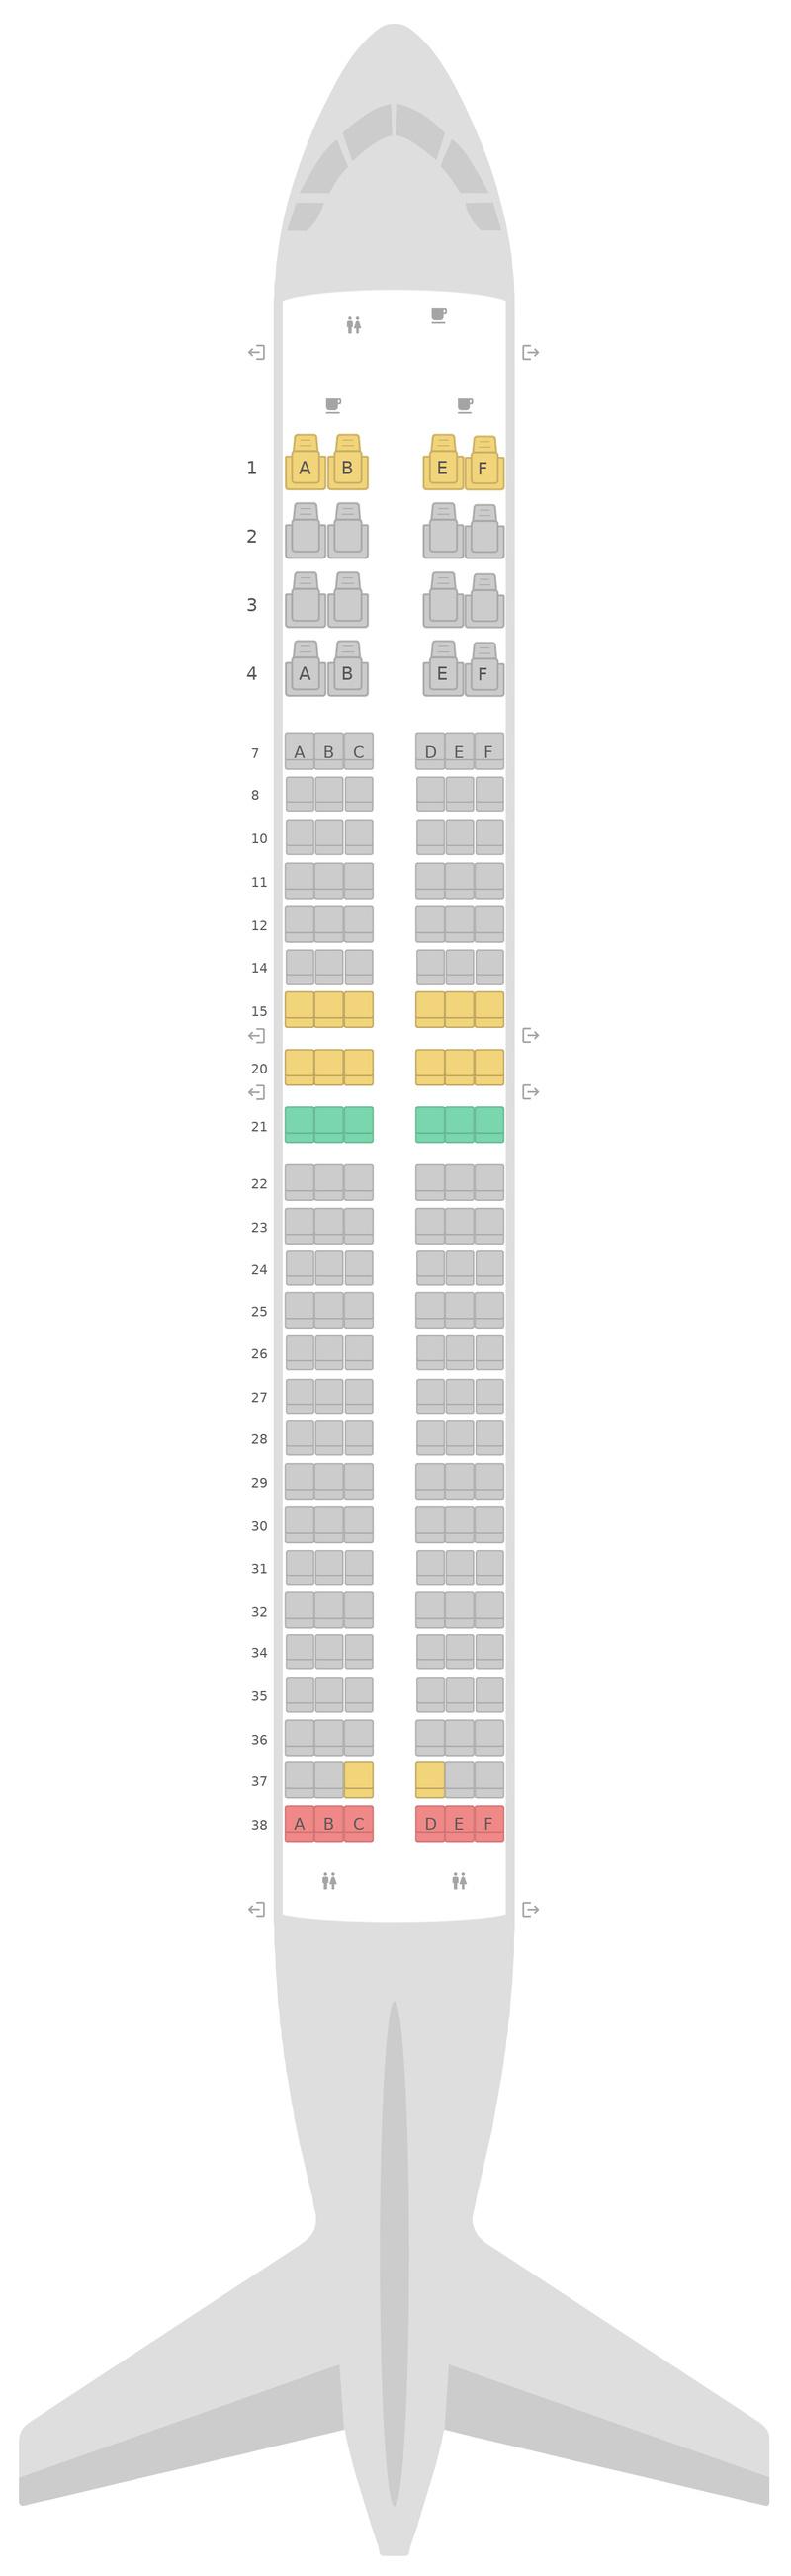 Seat Map United Boeing 737-800 (738) v1